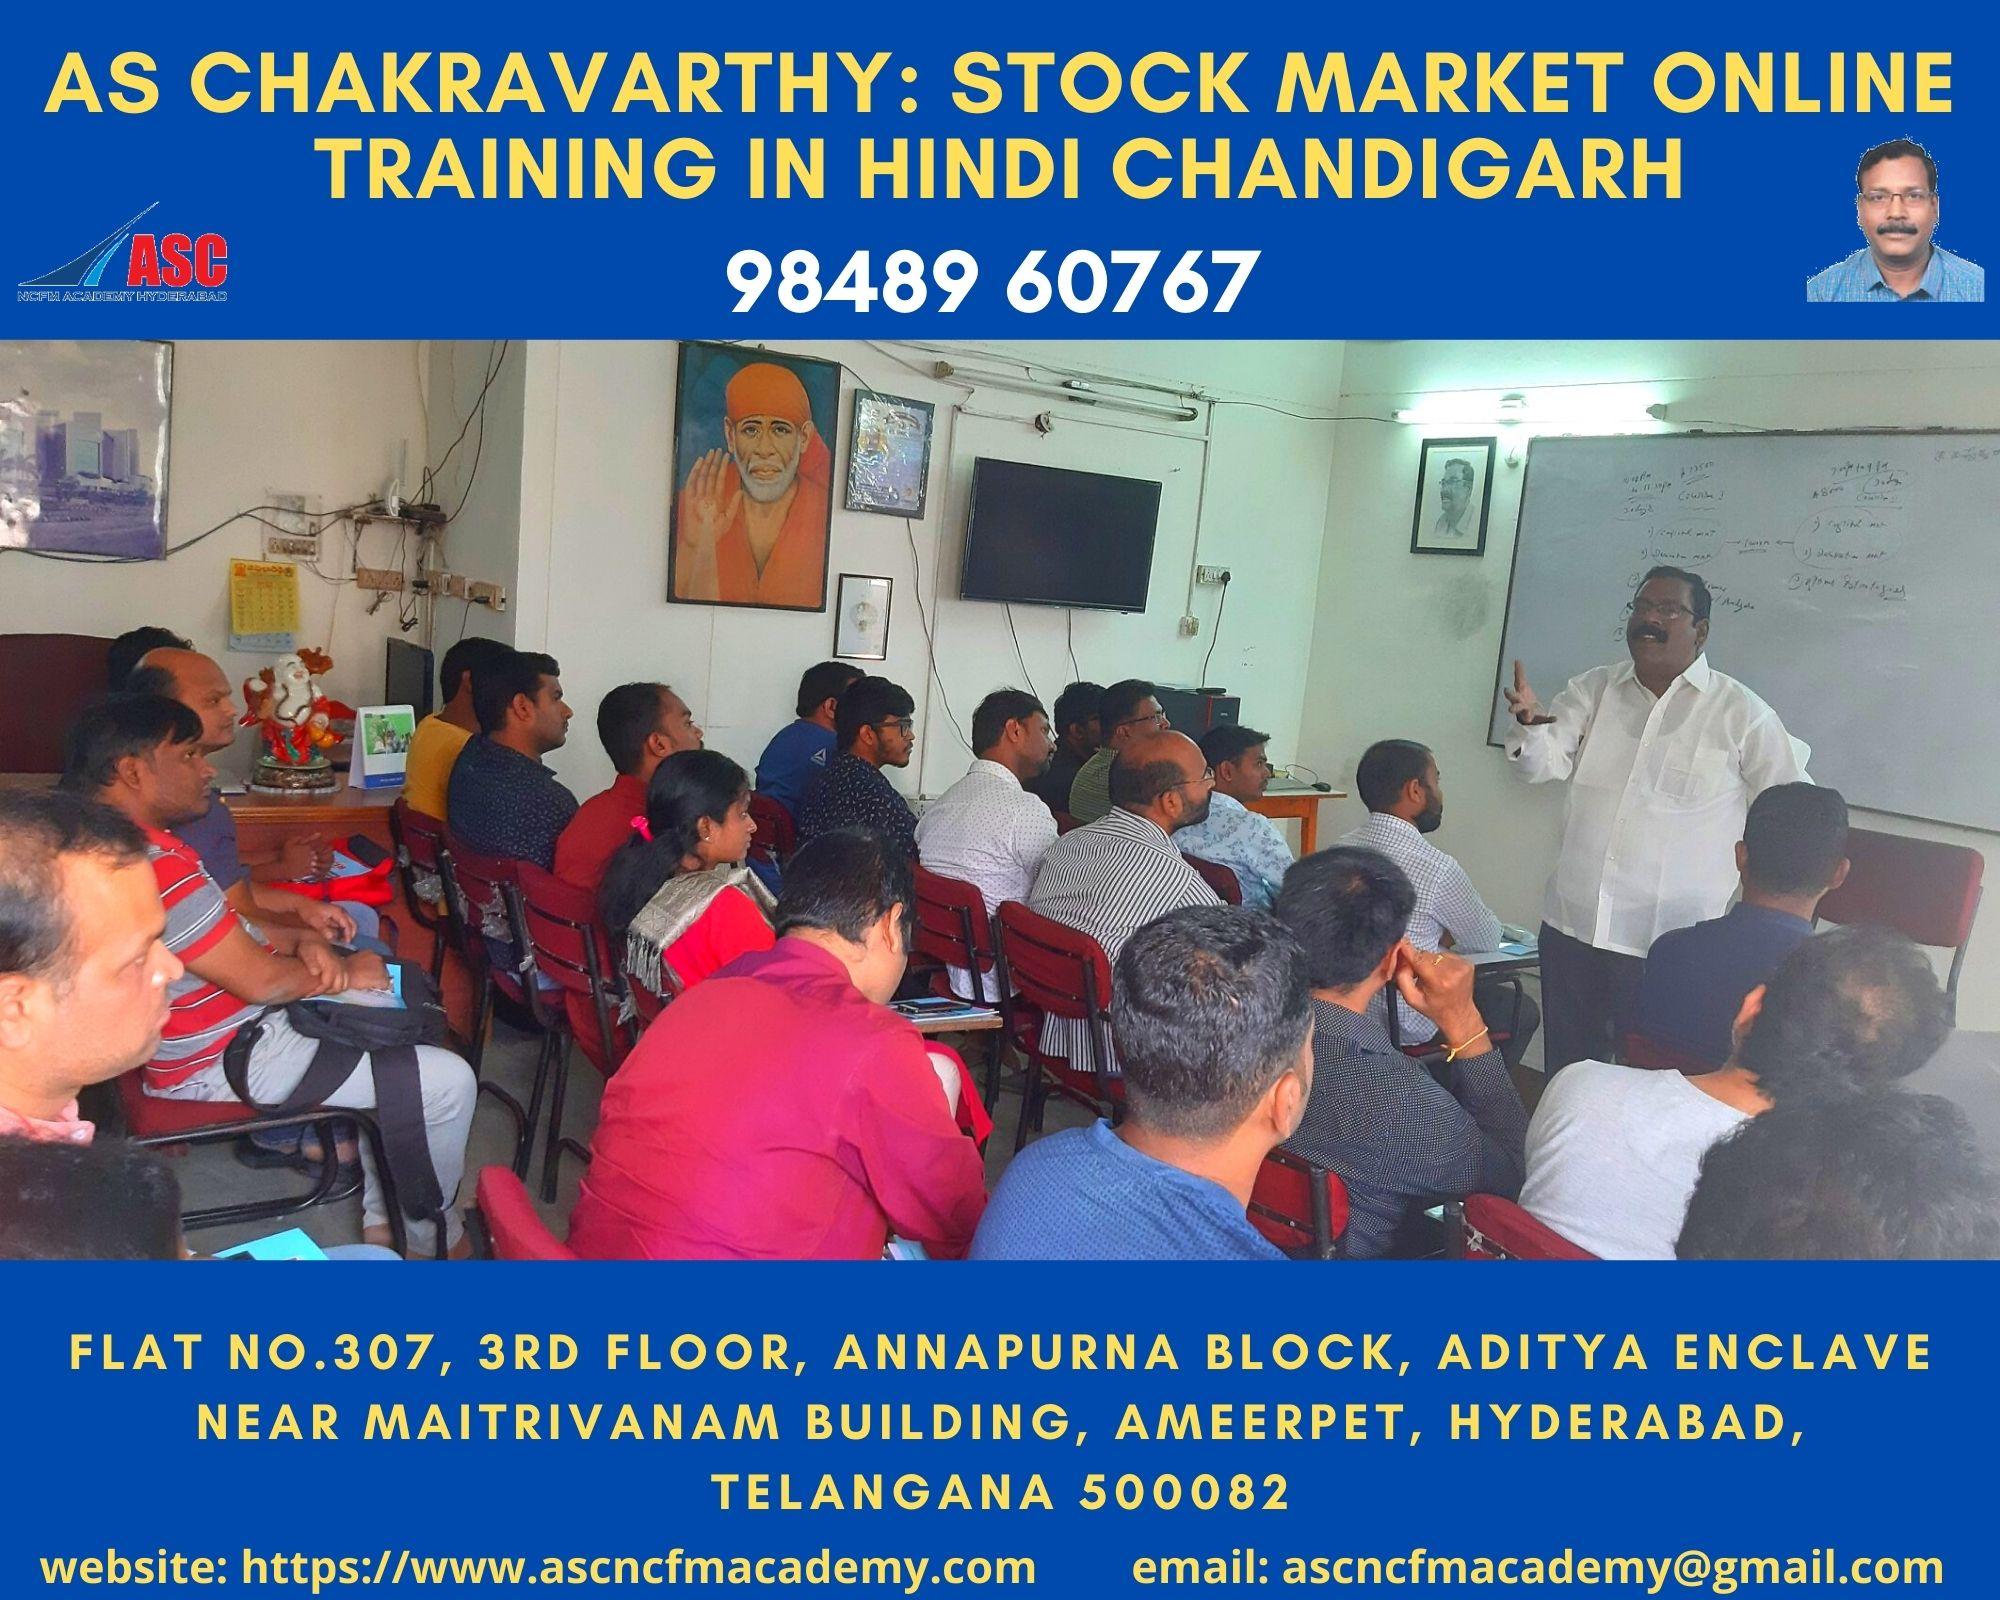 Online Stock Market Technical Training in Hindi Chandigarh